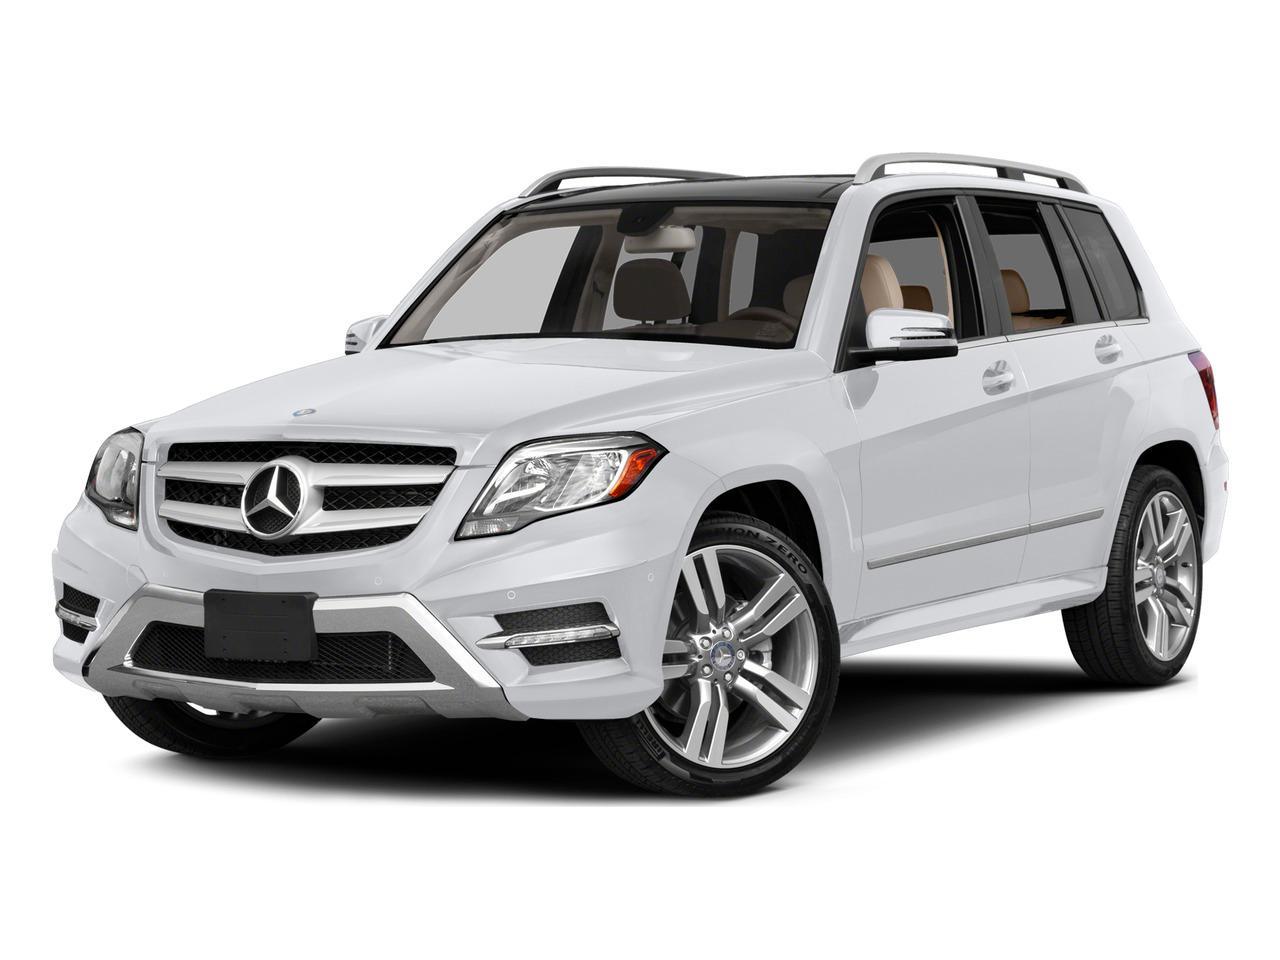 2015 Mercedes-Benz GLK-Class Vehicle Photo in Tulsa, OK 74133